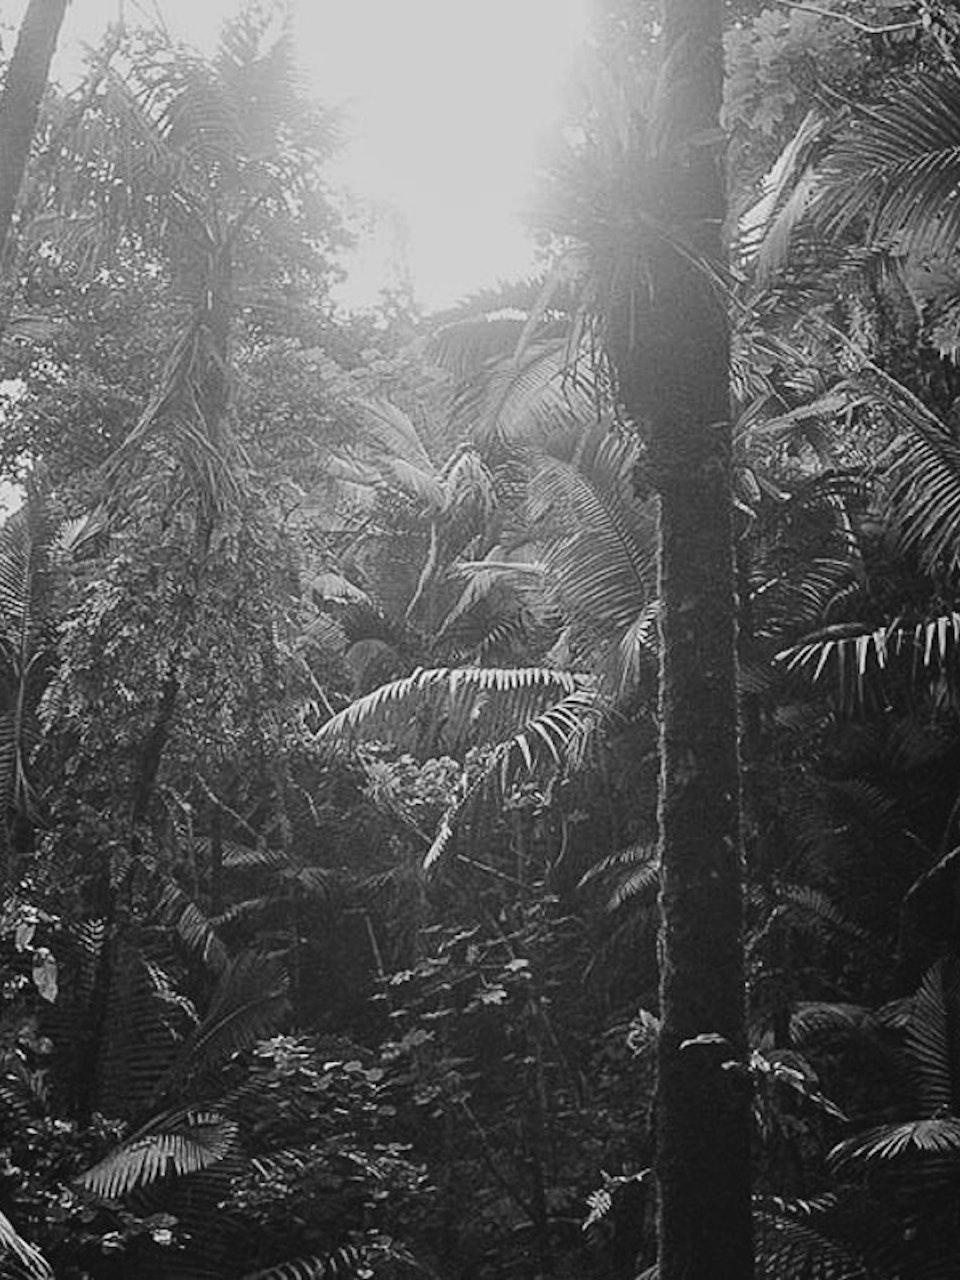 35mm Black and White Film - El Yunque National Rainforest, Rio Grande, Puerto Rico